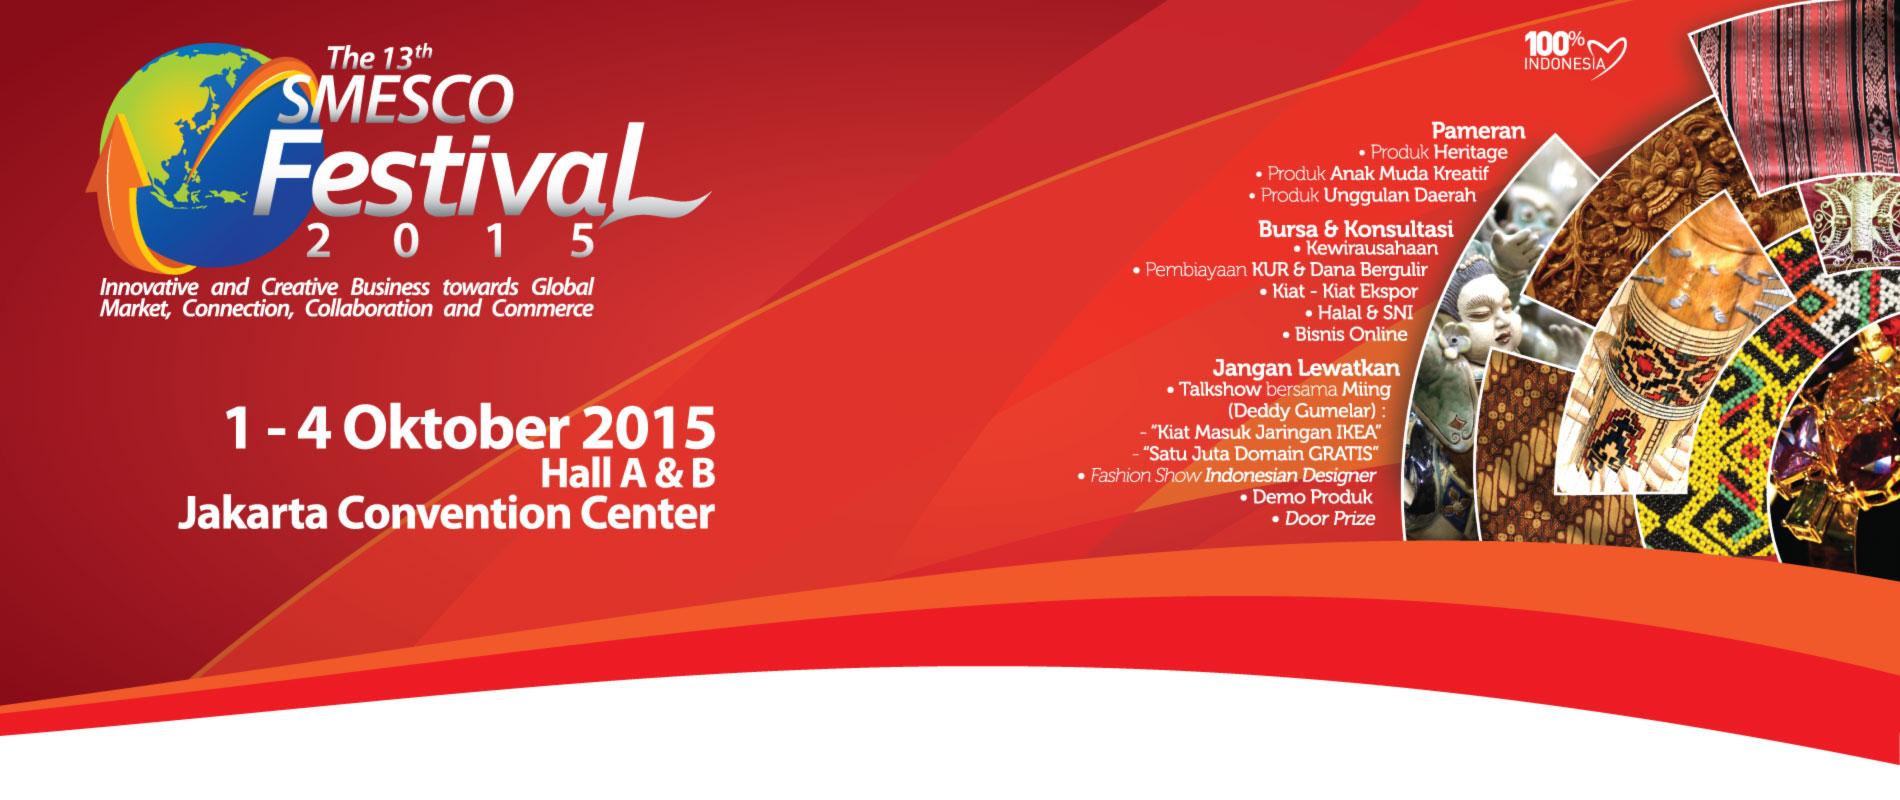 the 13th smesco festival 2015